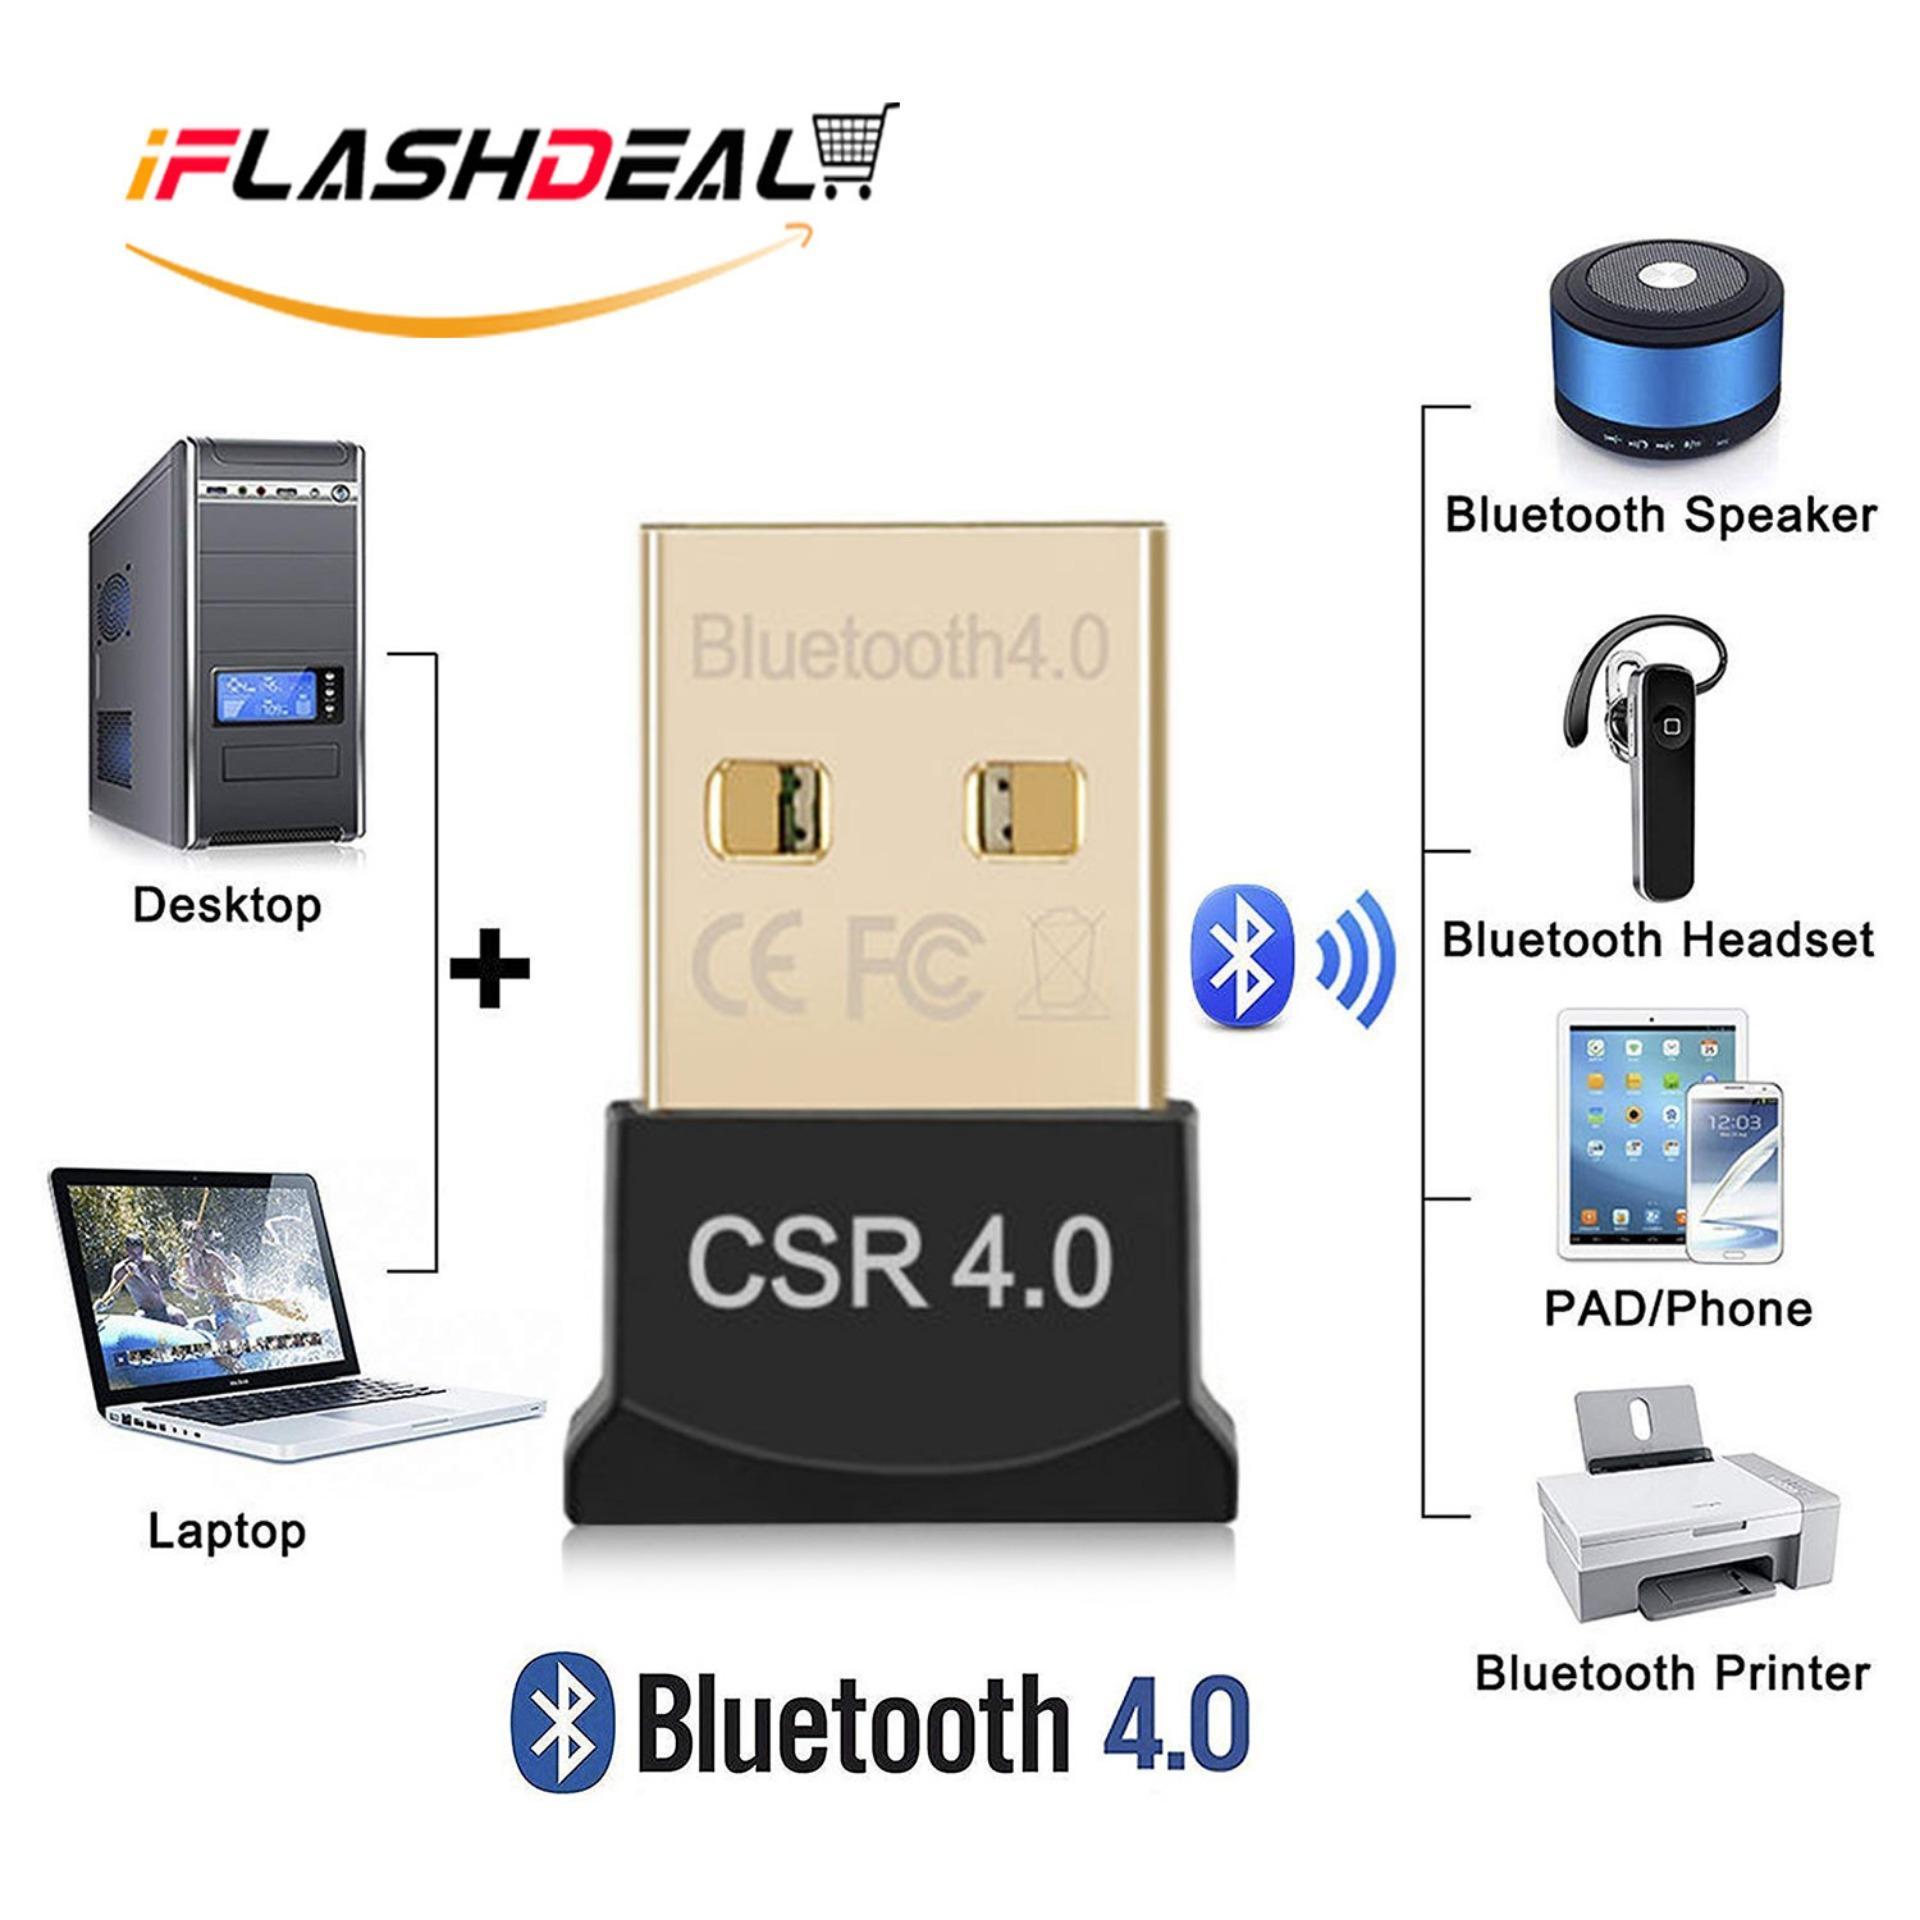 iFlashDeal USB Bluetooth Adapter for PC Wireless Dongle Mini Bluetooth USB Dongle Dual Mode Bluetooth 4.0